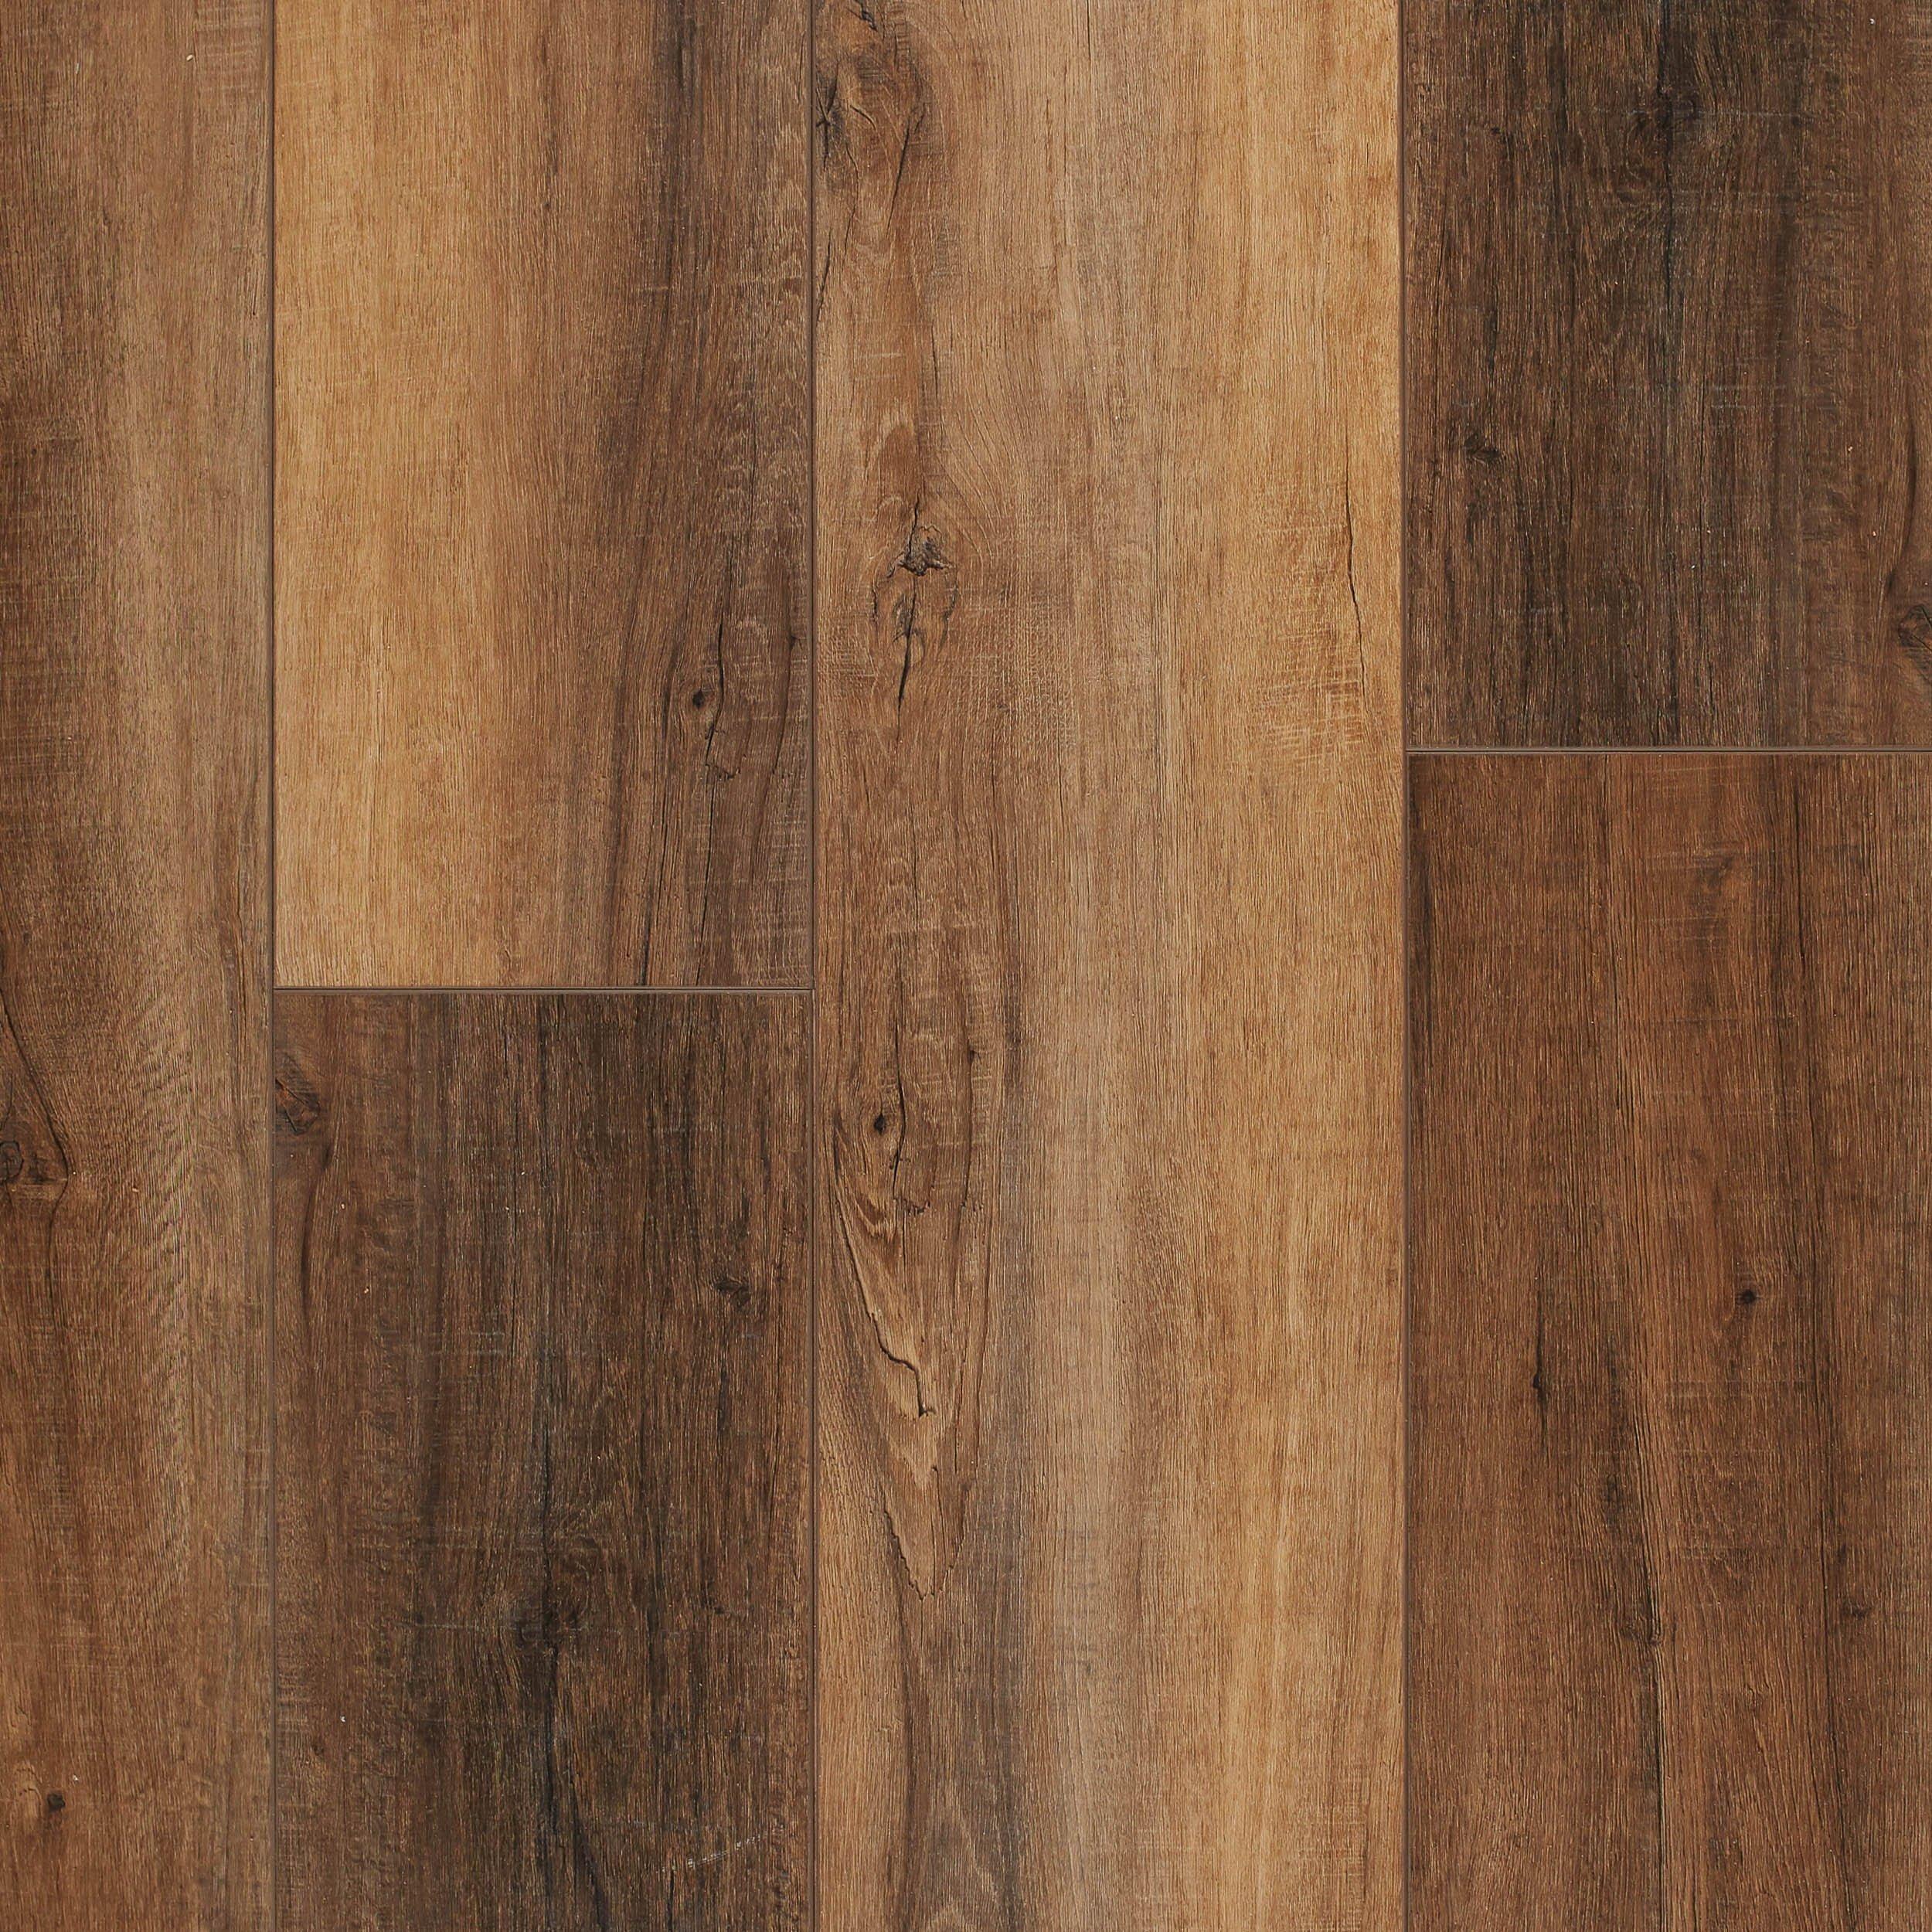 Titan Amber Grande Rigid Core Luxury Vinyl Plank Cork